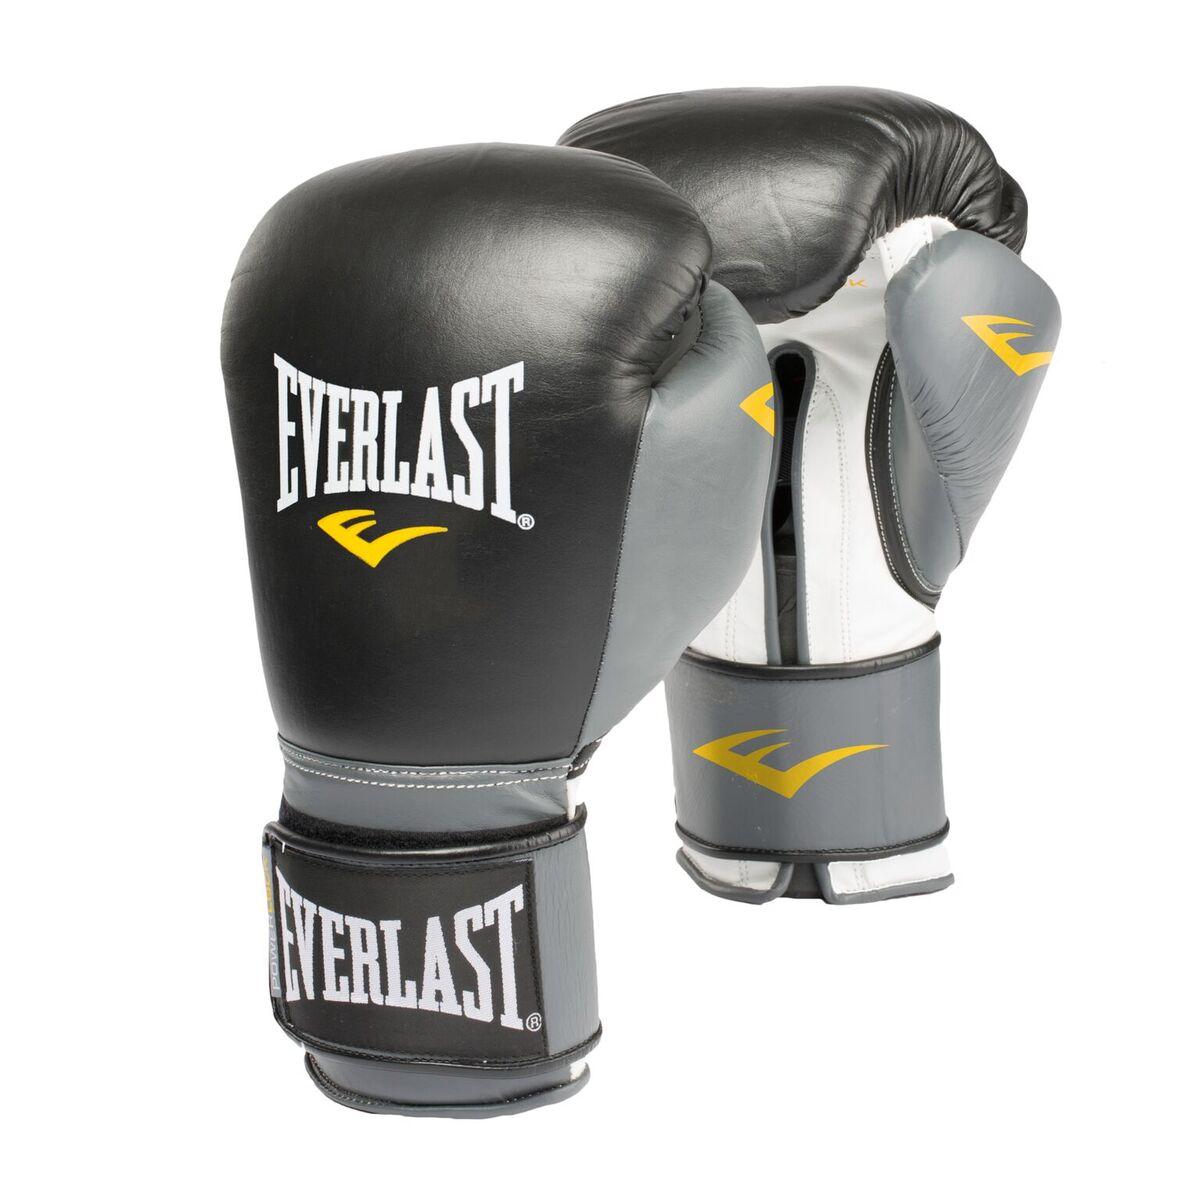 Professional Powerlock Training Boxing Gloves in White//Silver Everlast 12oz